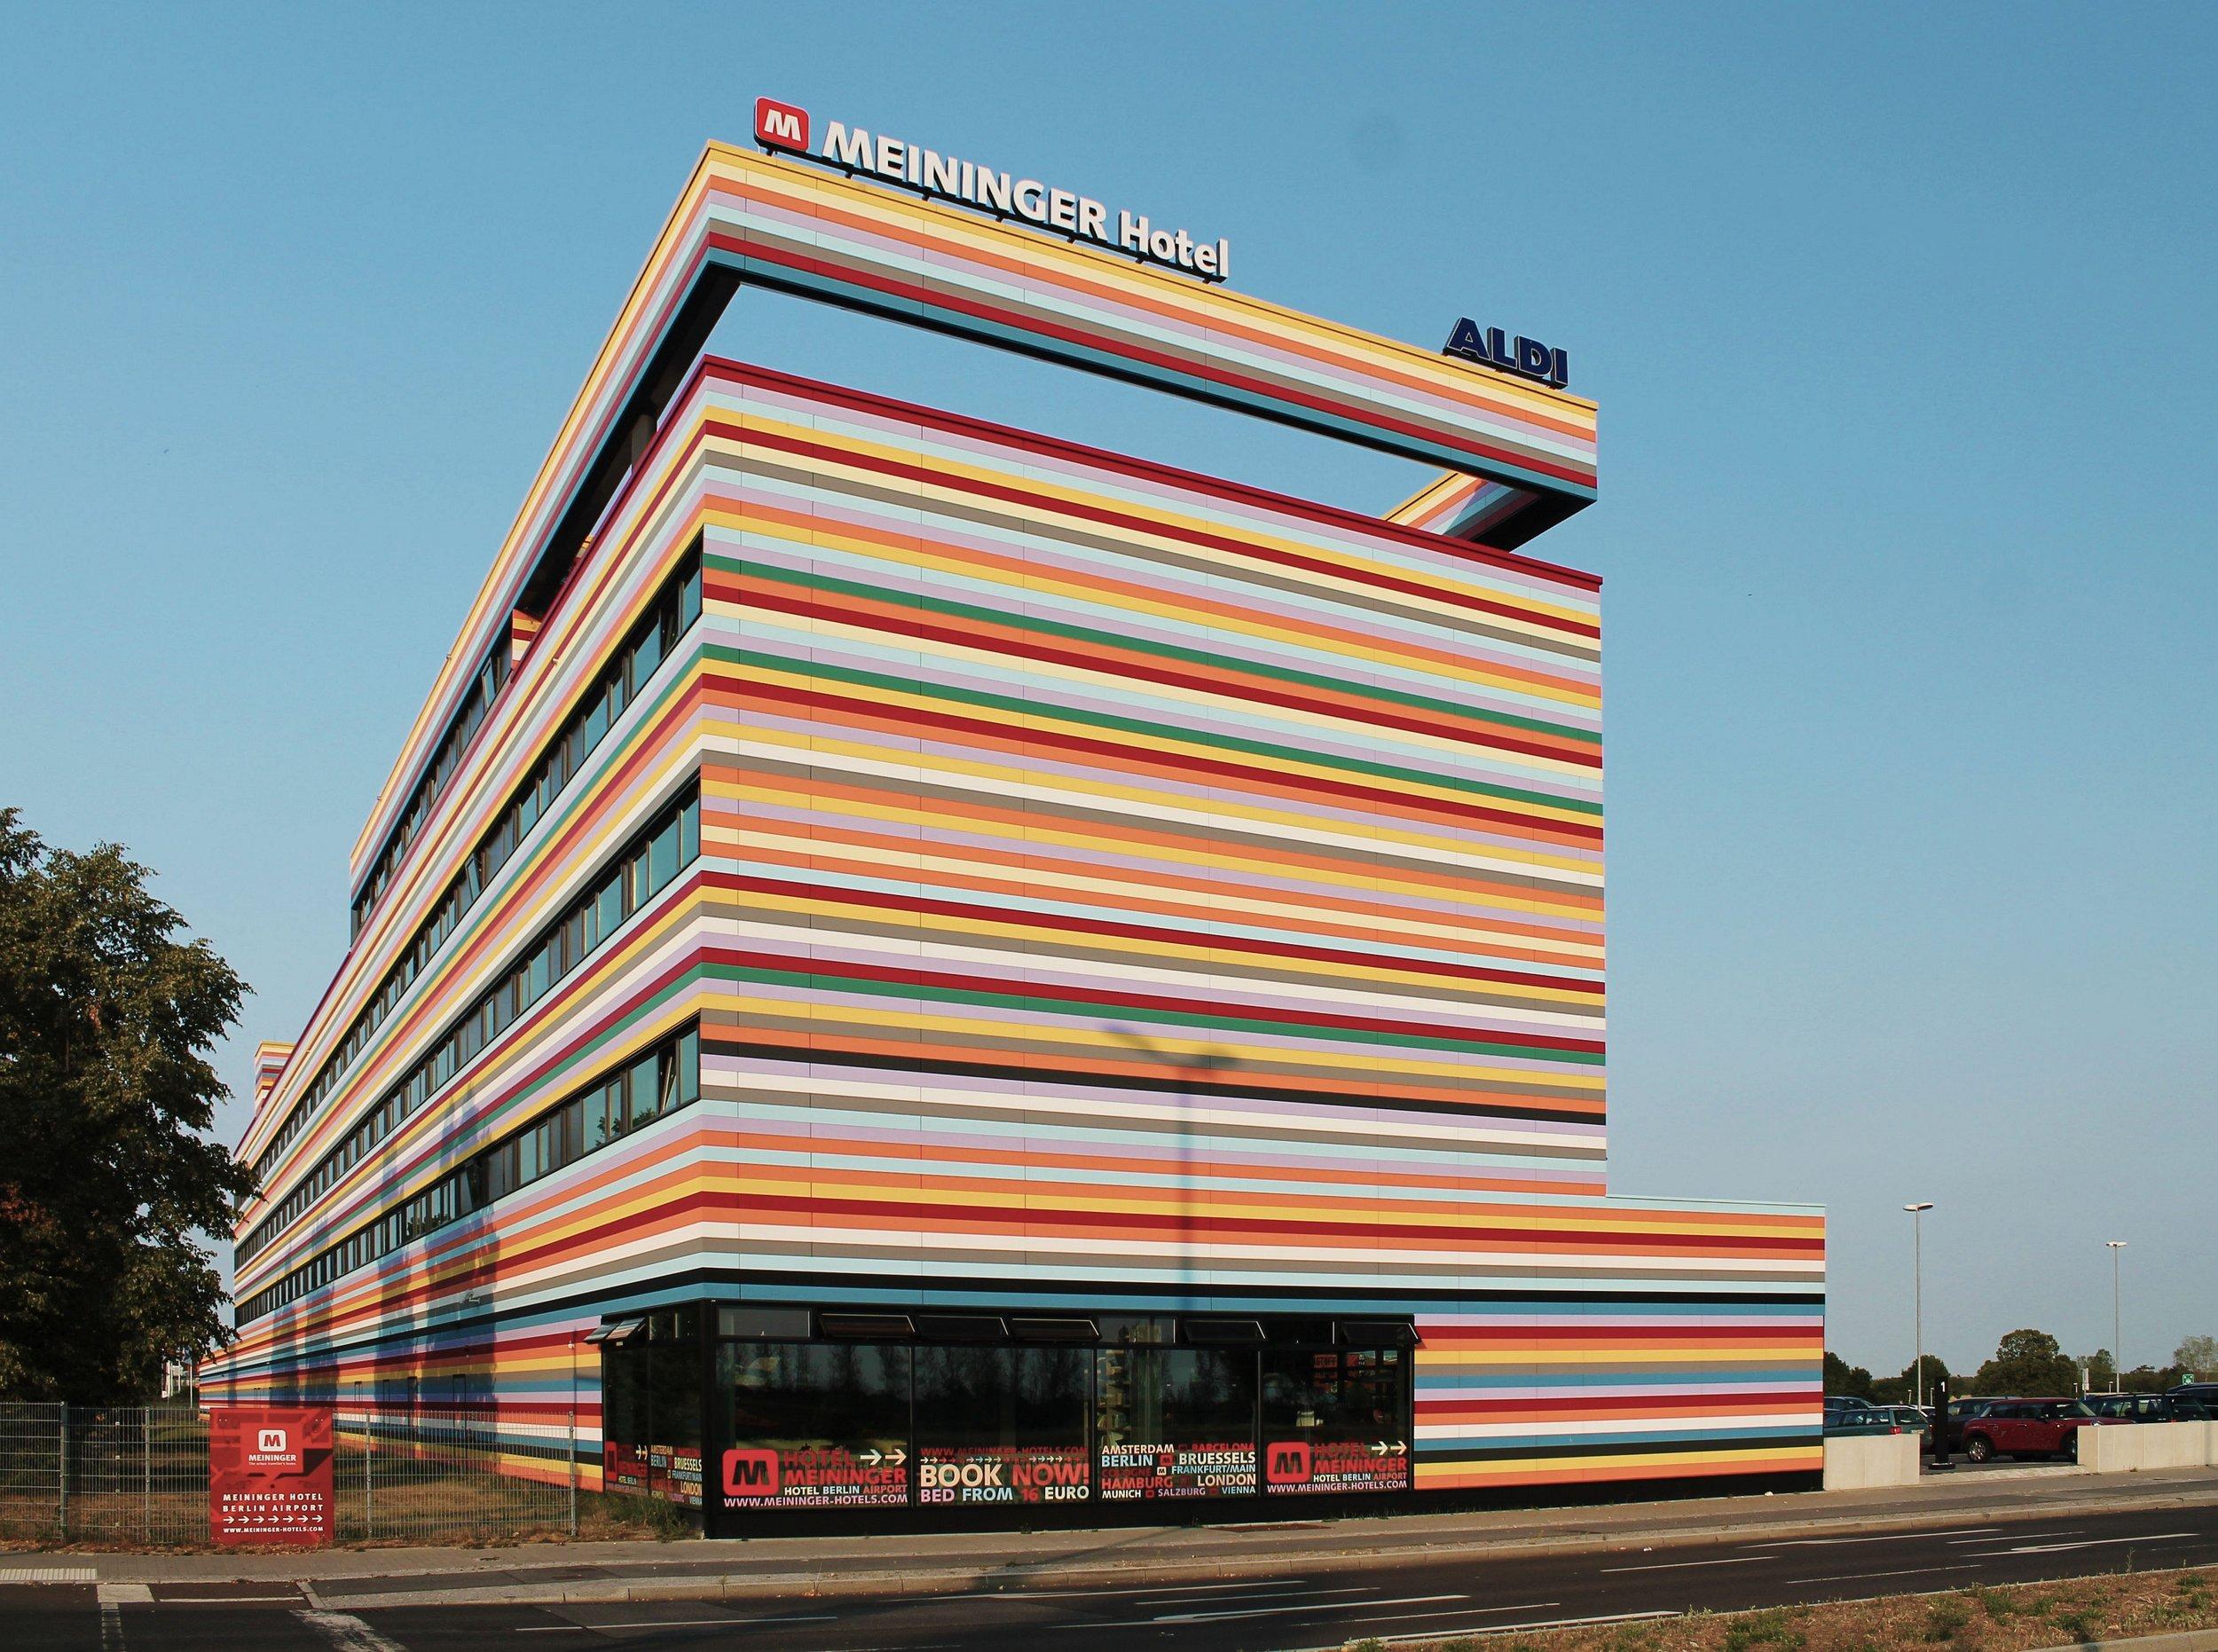 BBI Airporthotel, Berlin /PETERSEN ARCHITEKTEN MBH, Berlin